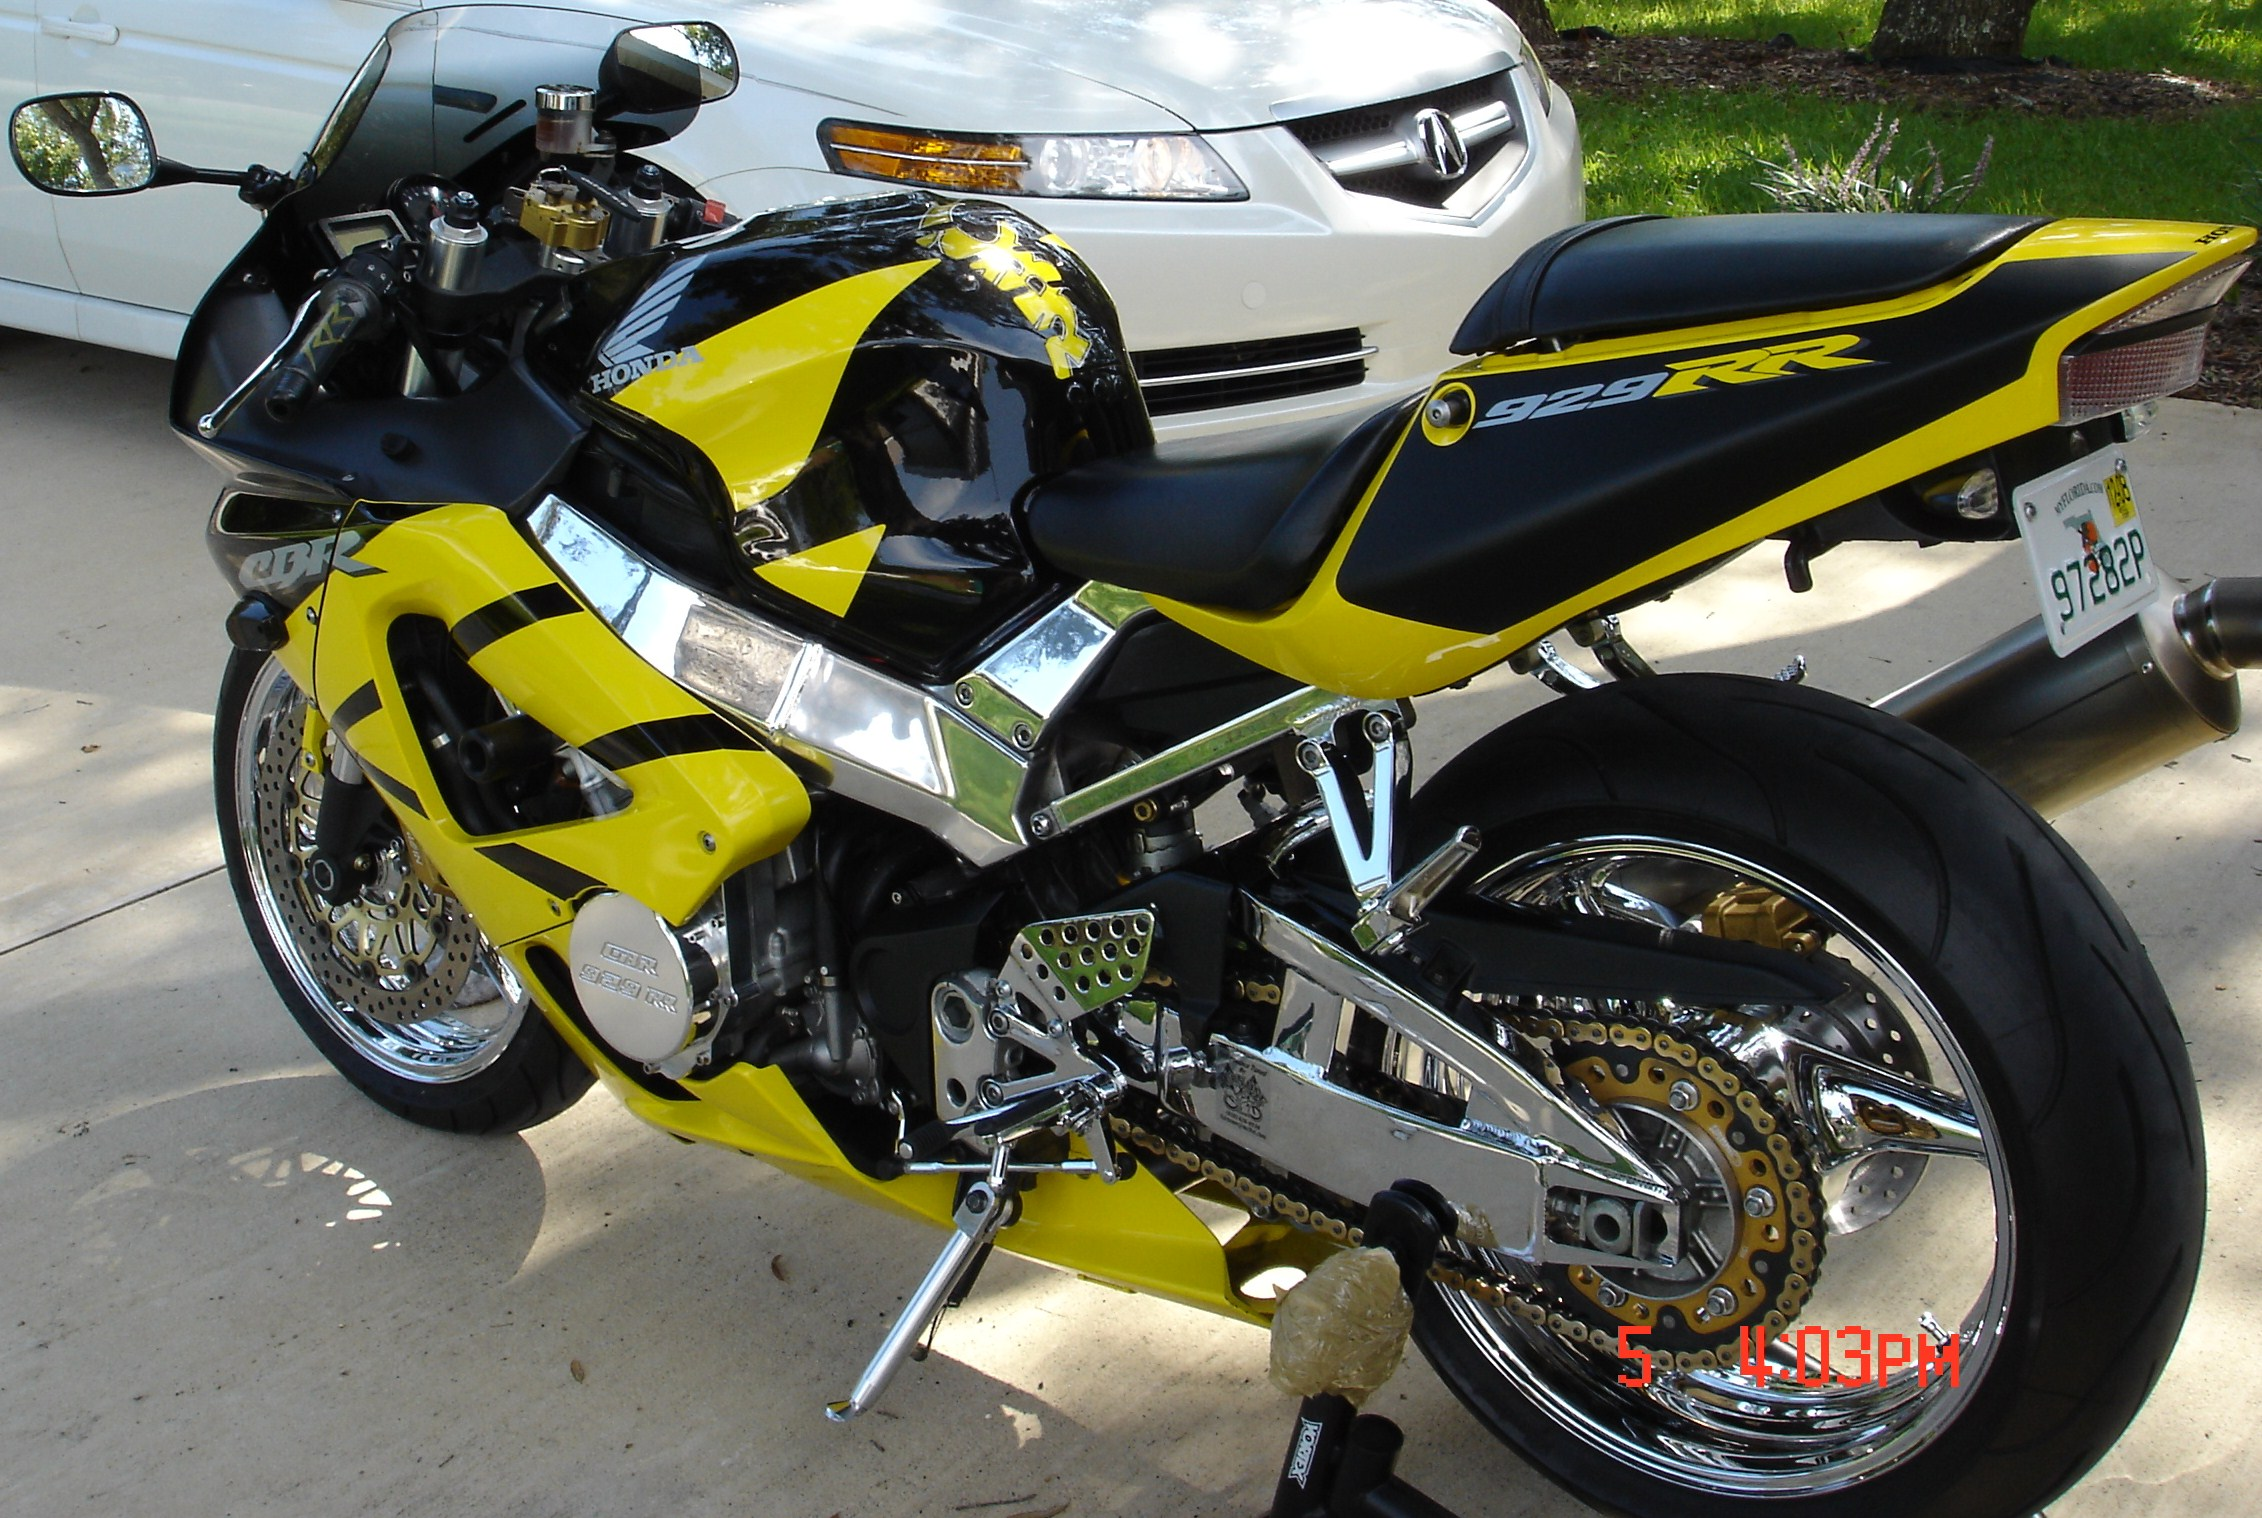 fs 2001 cbr 929rr located in shalimar fl sportbikesnet